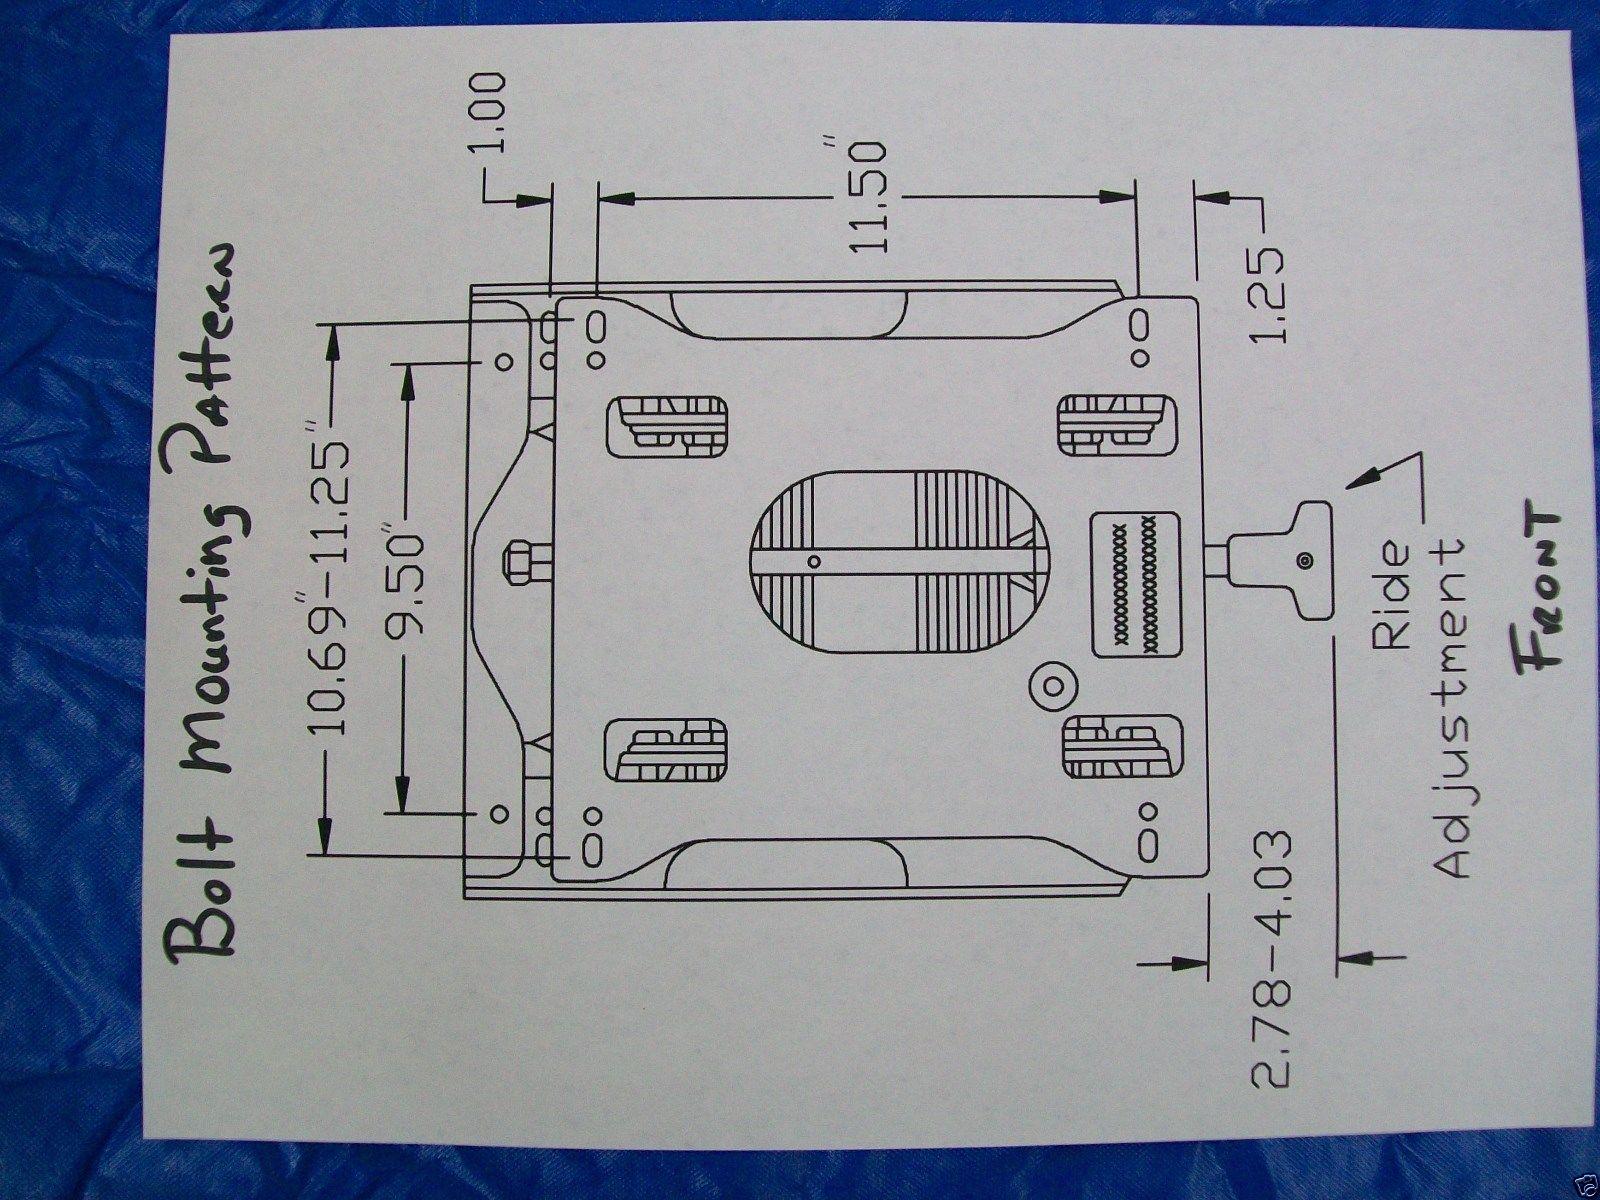 Toro Exmark Wiring Diagram Schematics Diagrams Ex Mark Lazer Z Pto Switch Seat Suspension Kubota John Deere Trak Gravely Rh Warehouse Com Lawn Mower Starter Solenoid Electrical